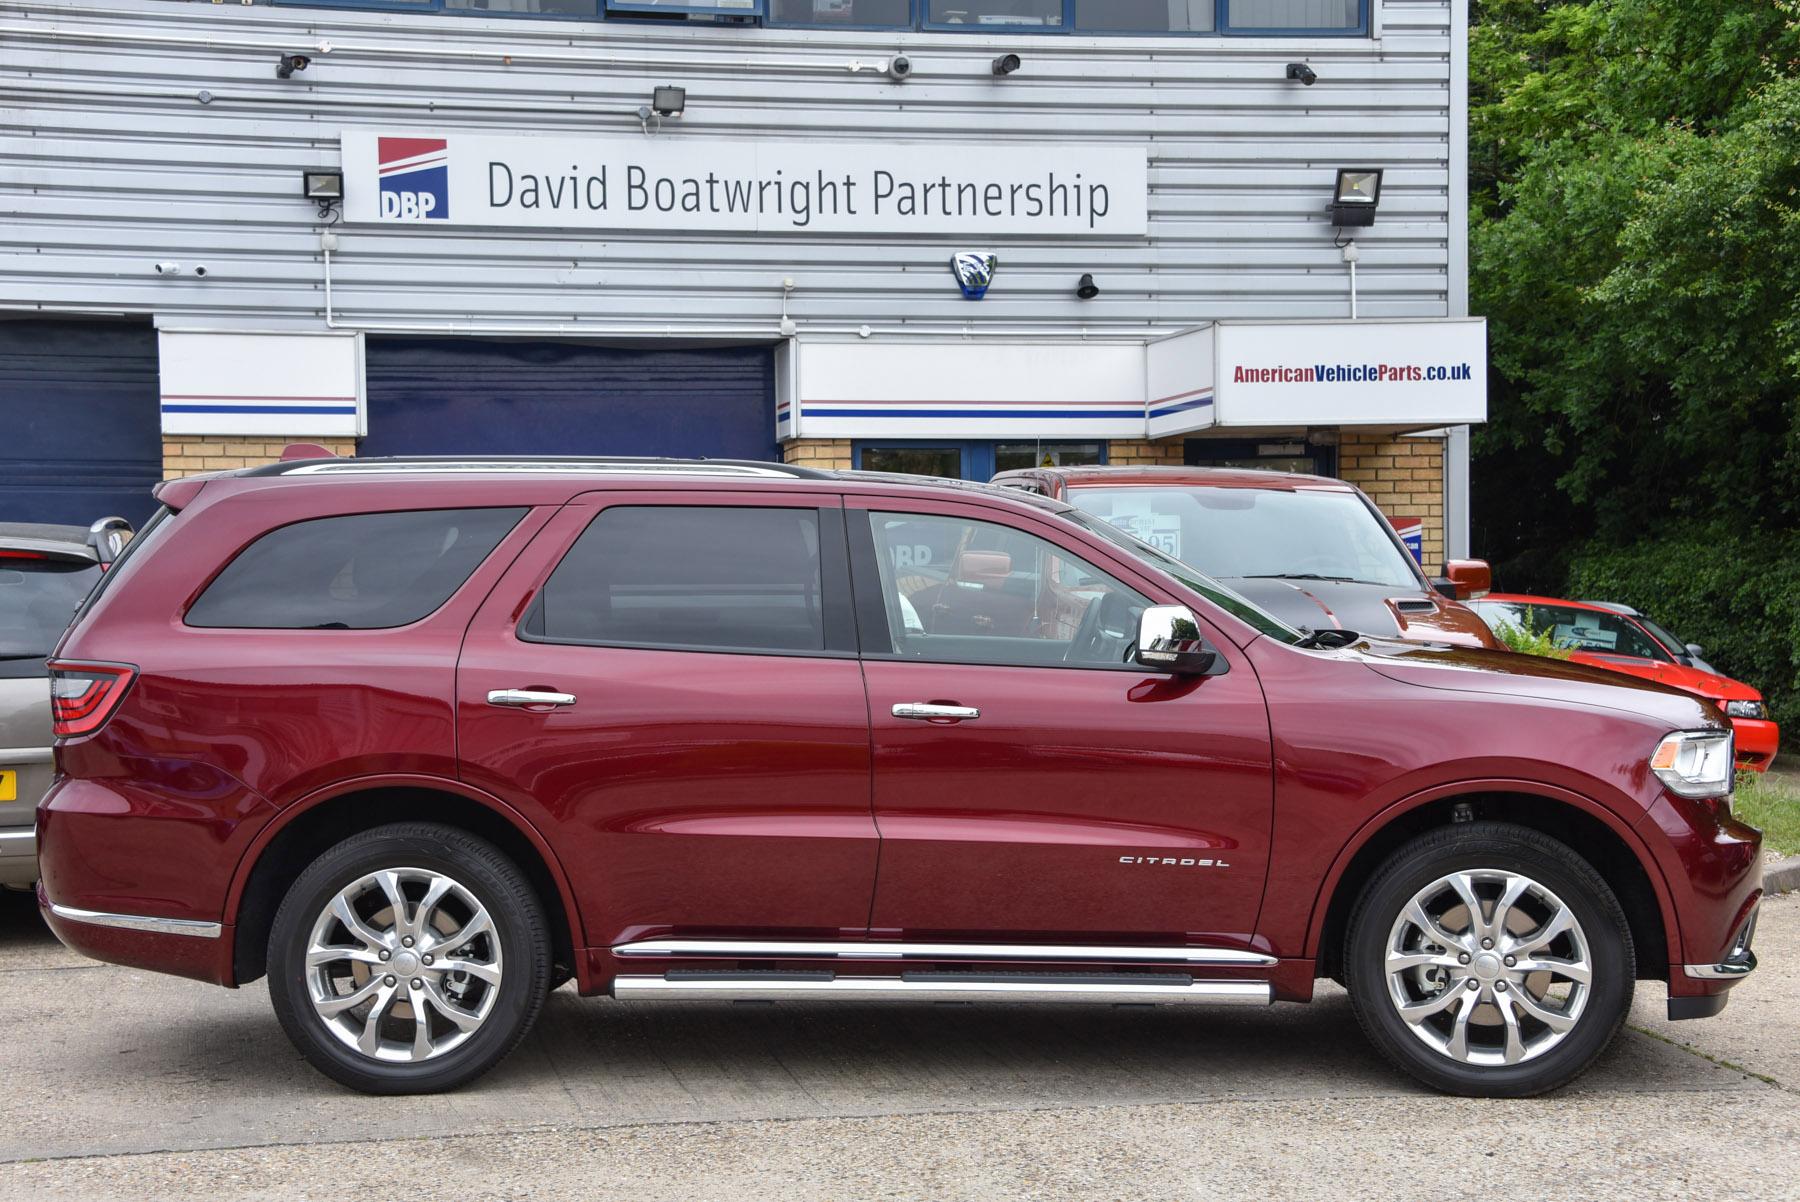 New American Vehicles to Order – David Boatwright Partnership